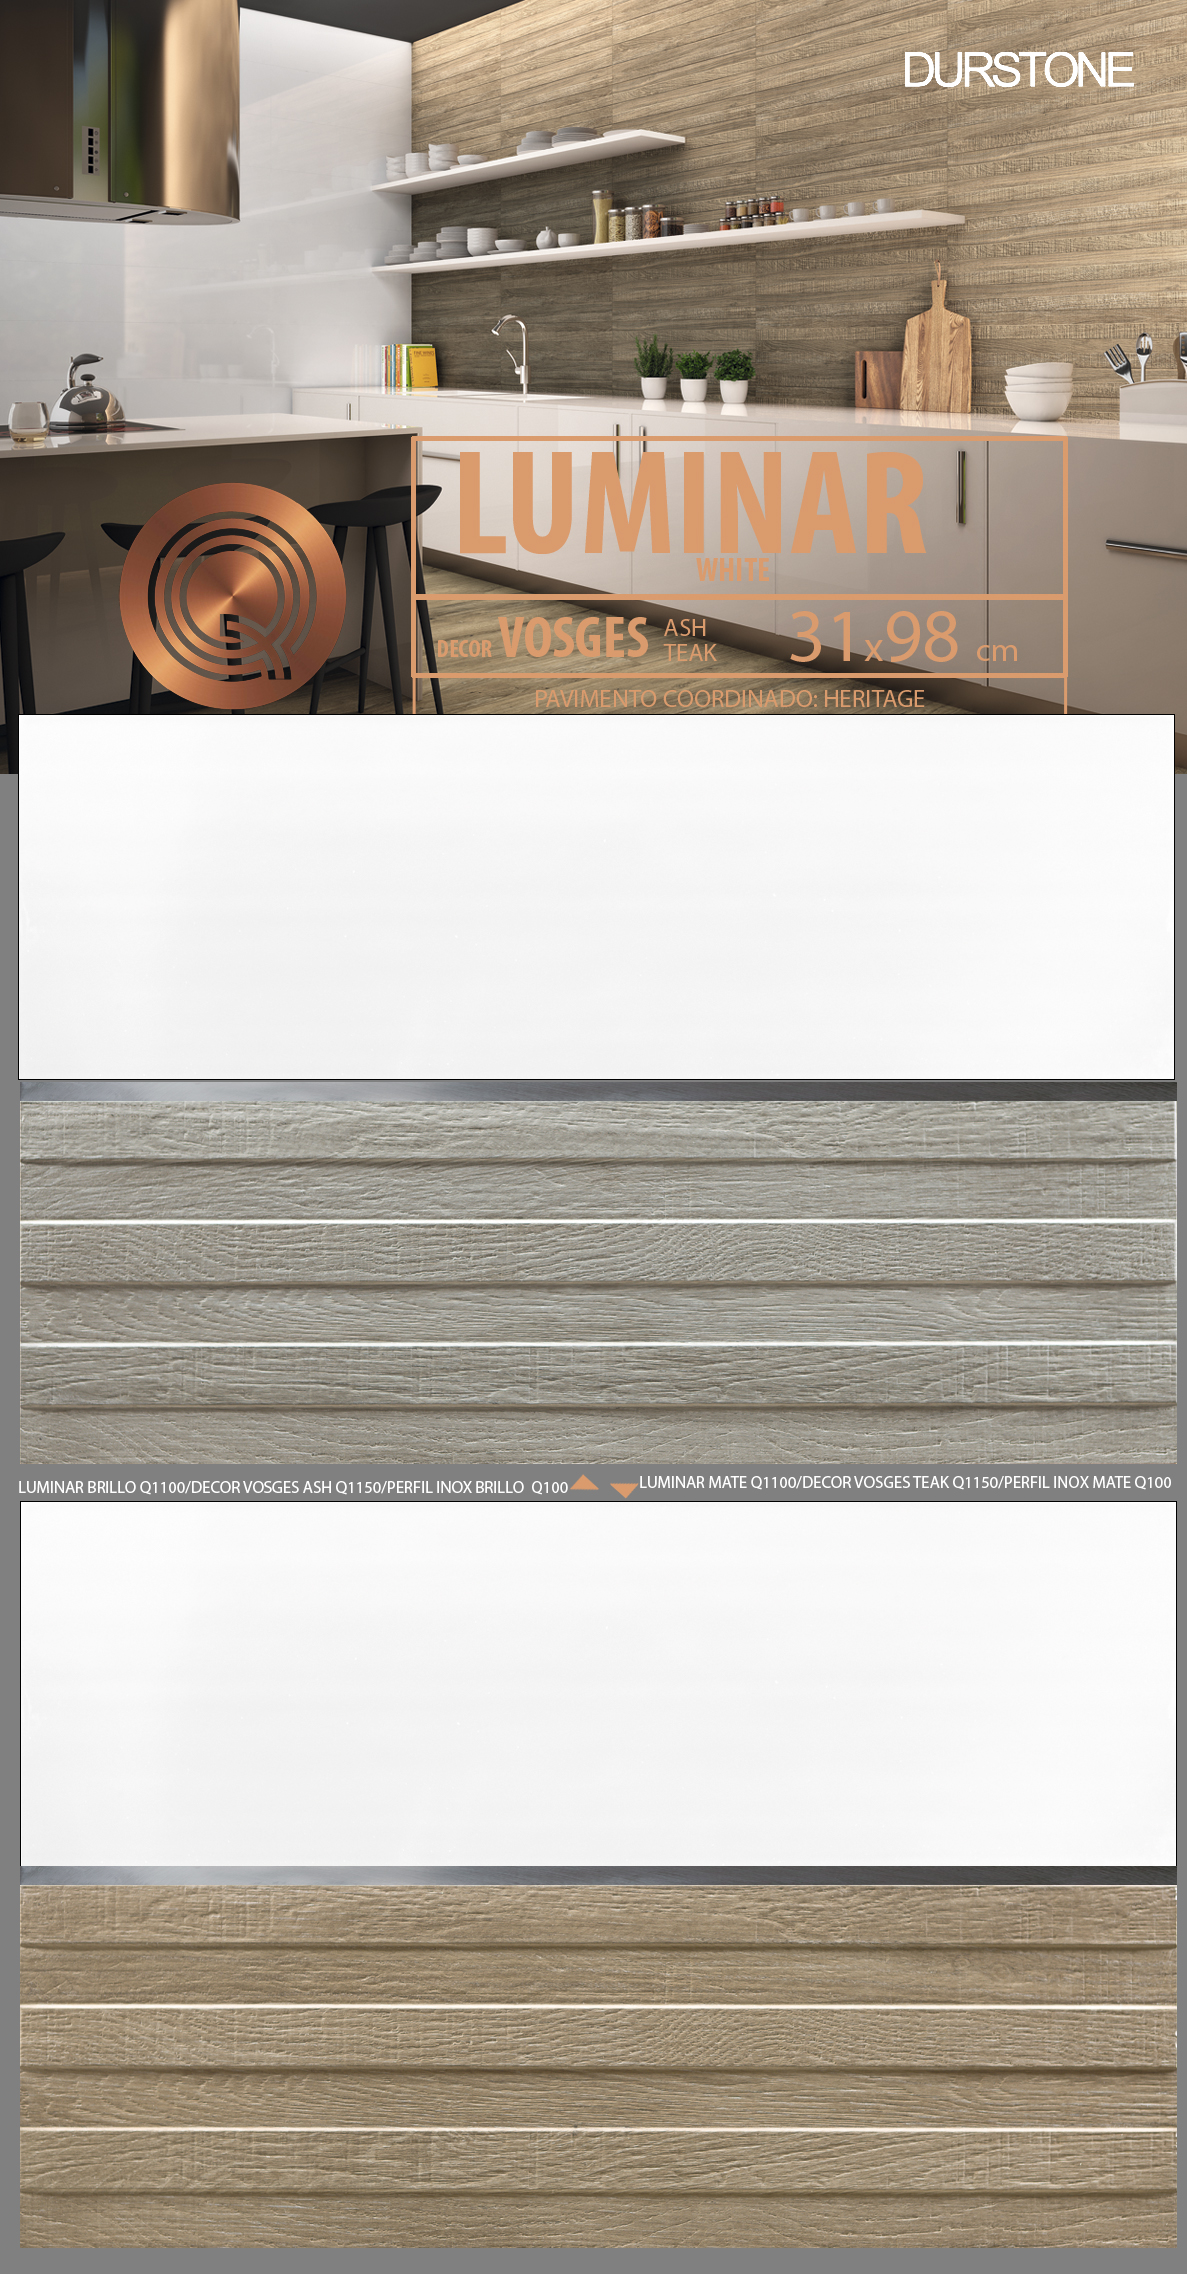 5236 RV PANEL LUMINAR-1 VOSGES Cod. 5236